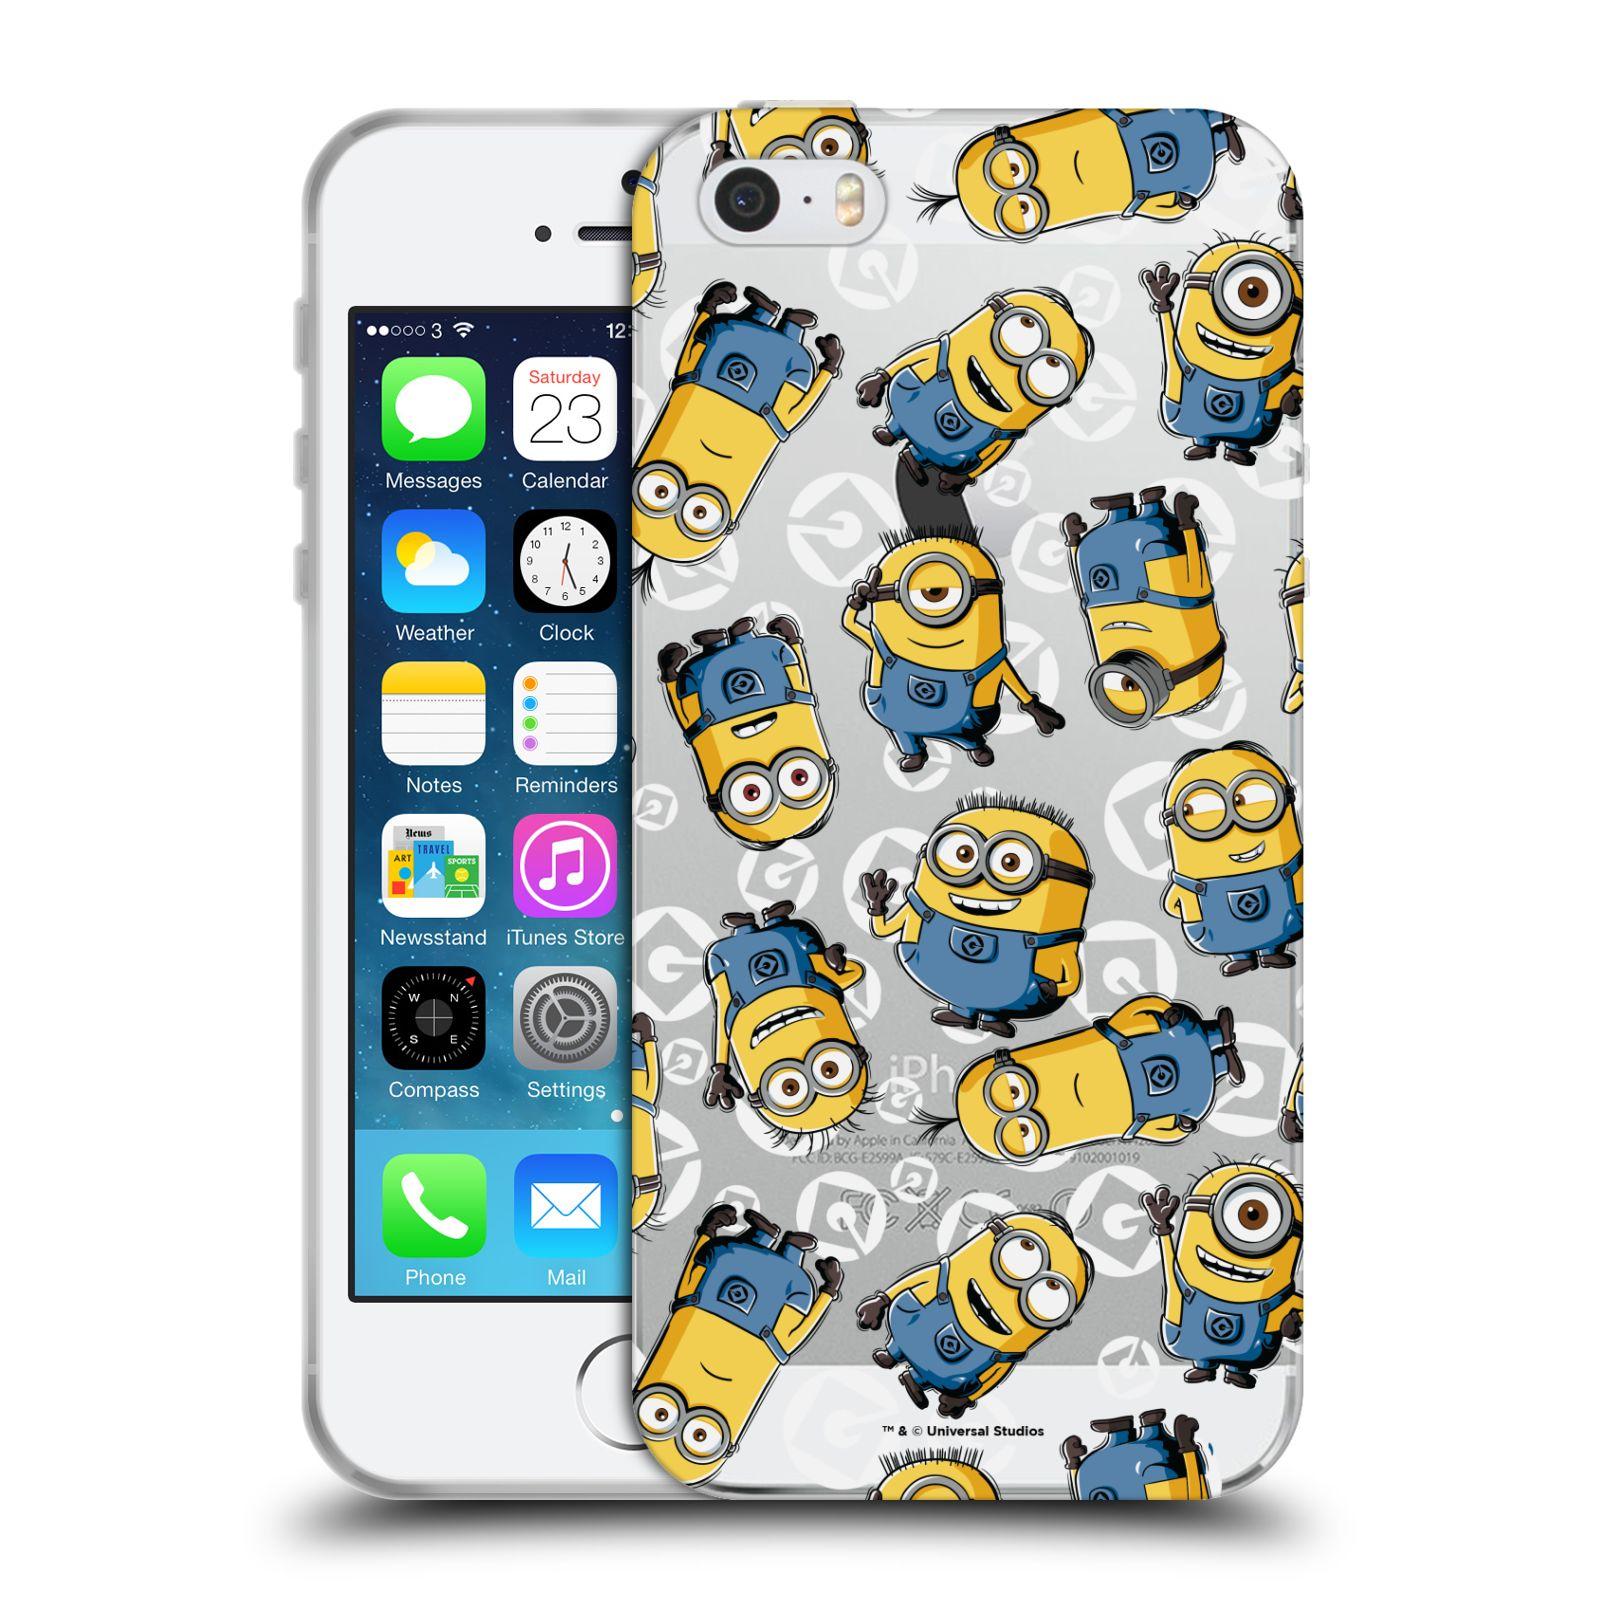 Silikonové pouzdro na mobil Apple iPhone 5, 5S, SE - Head Case - Minion pattern z filmu Já, padouch - Despicable Me